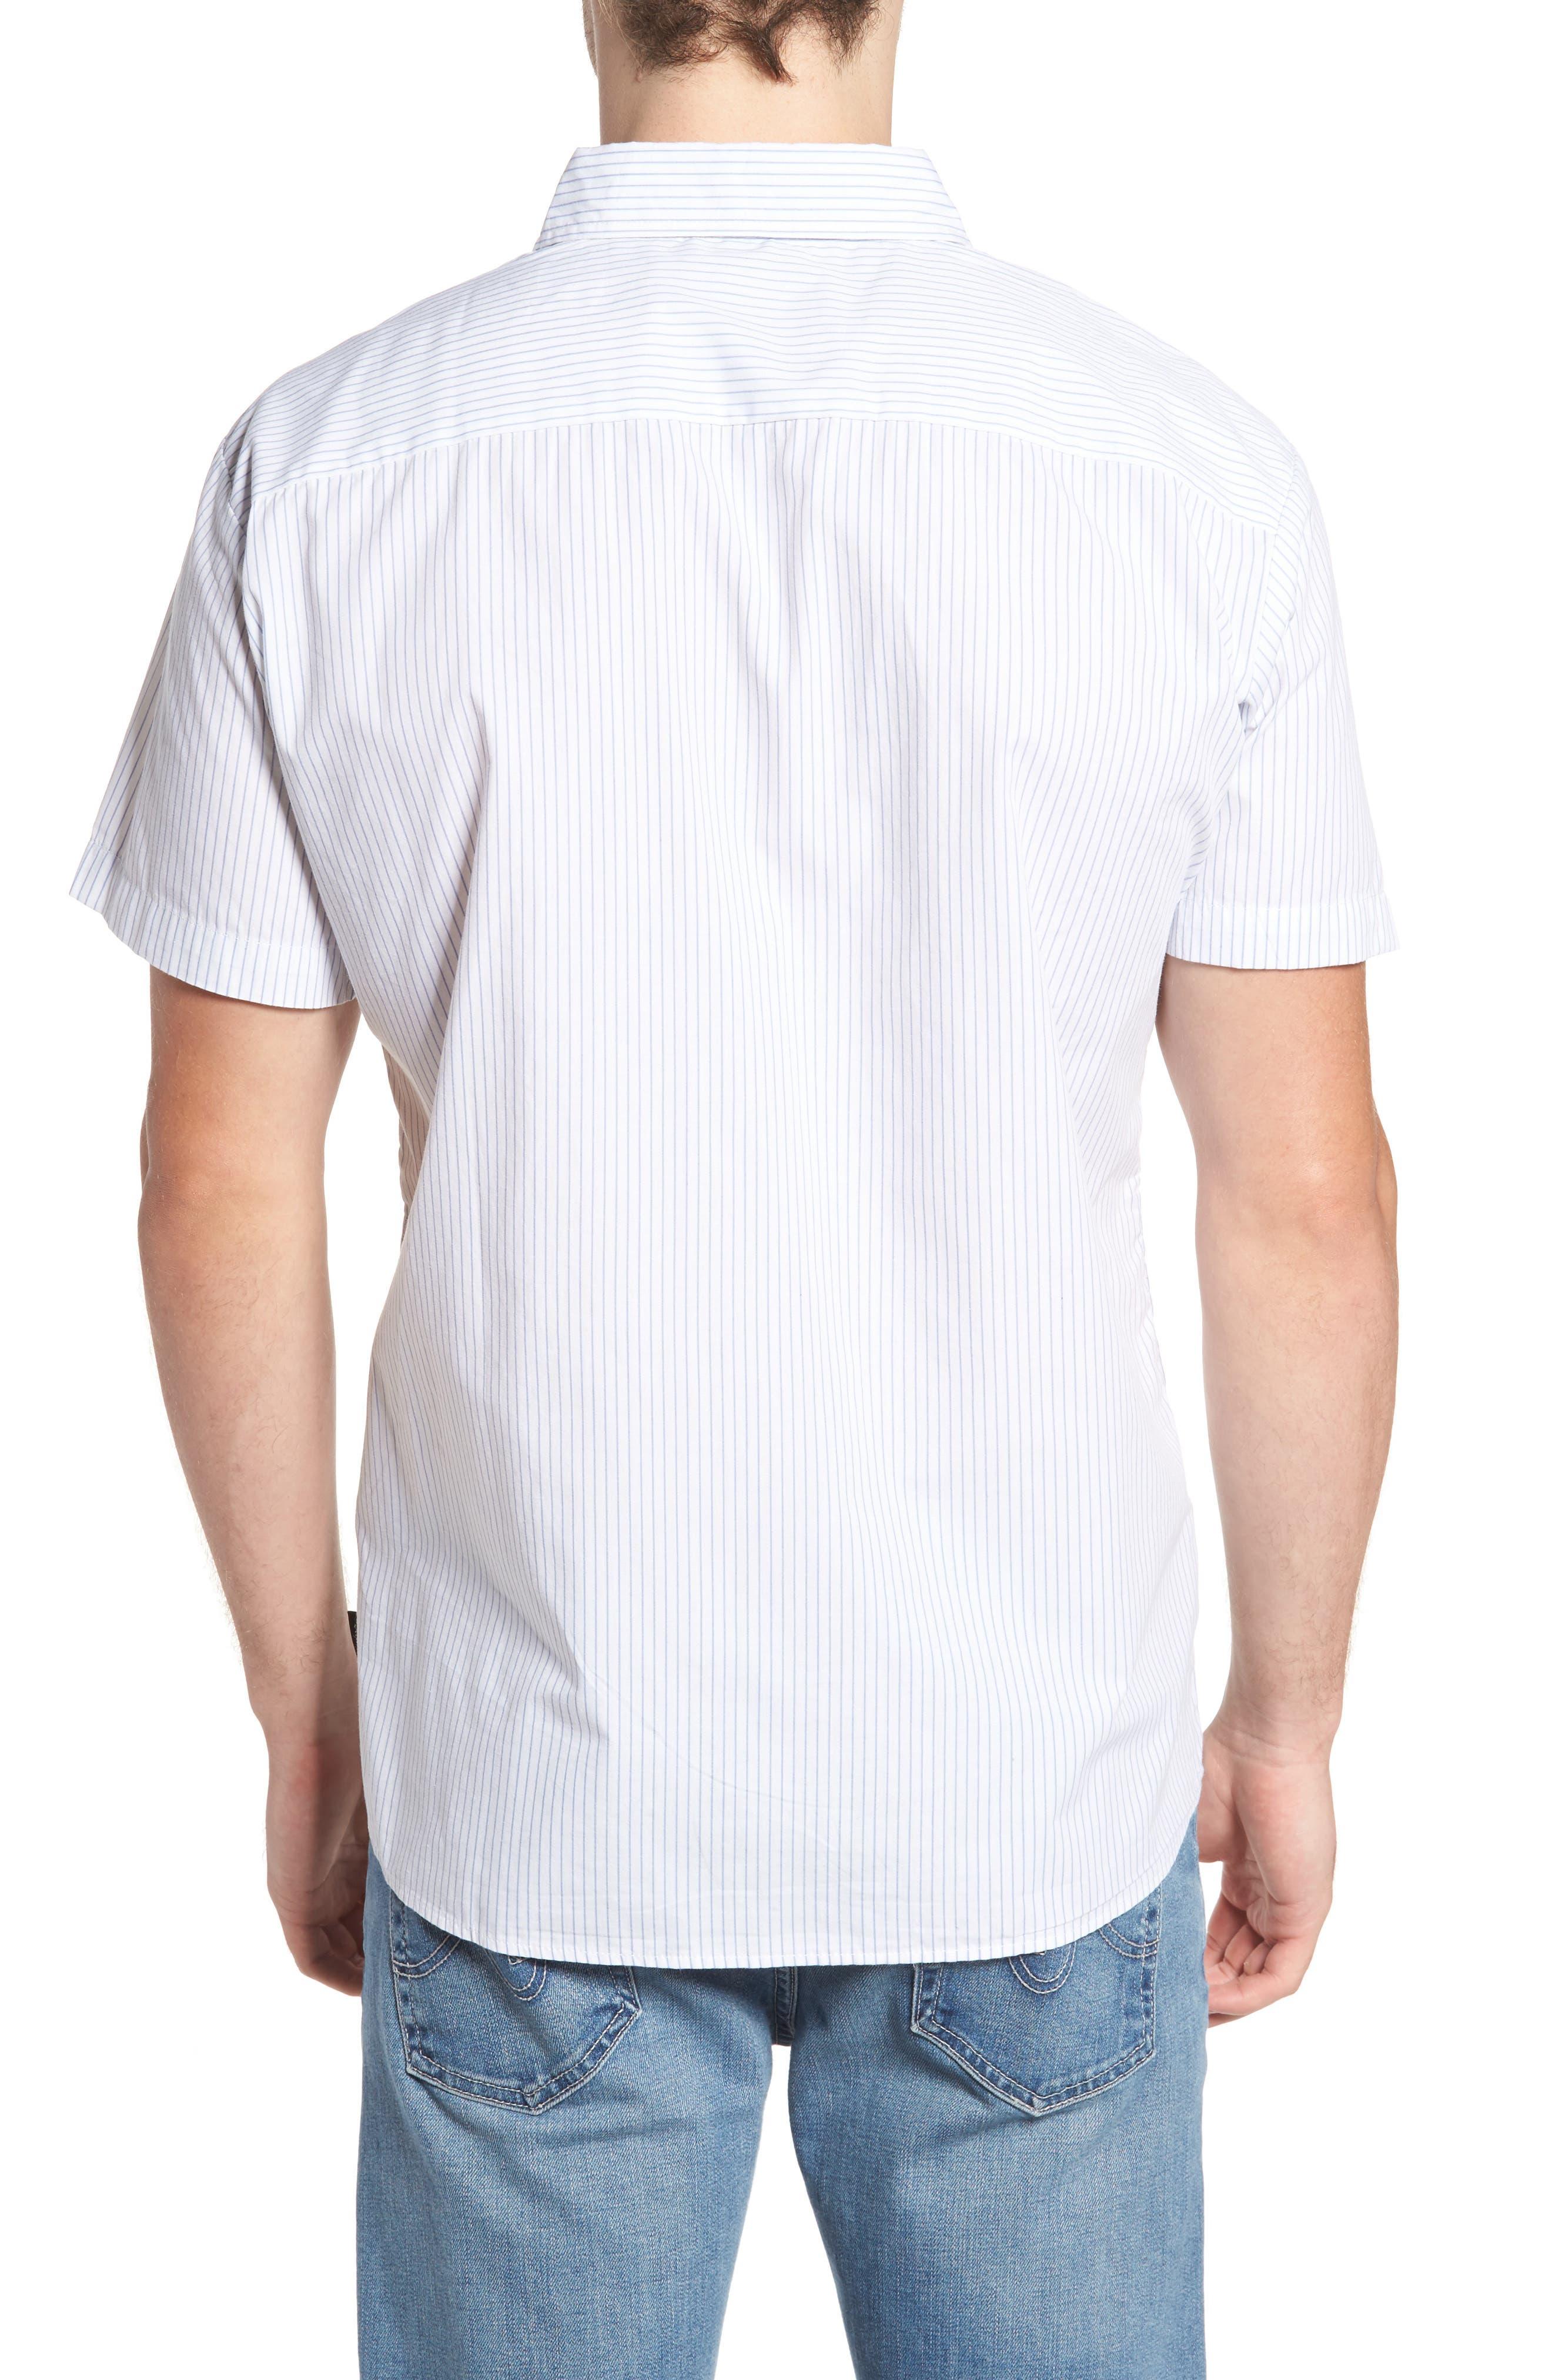 Reeve Pinstripe Woven Shirt,                             Alternate thumbnail 2, color,                             100